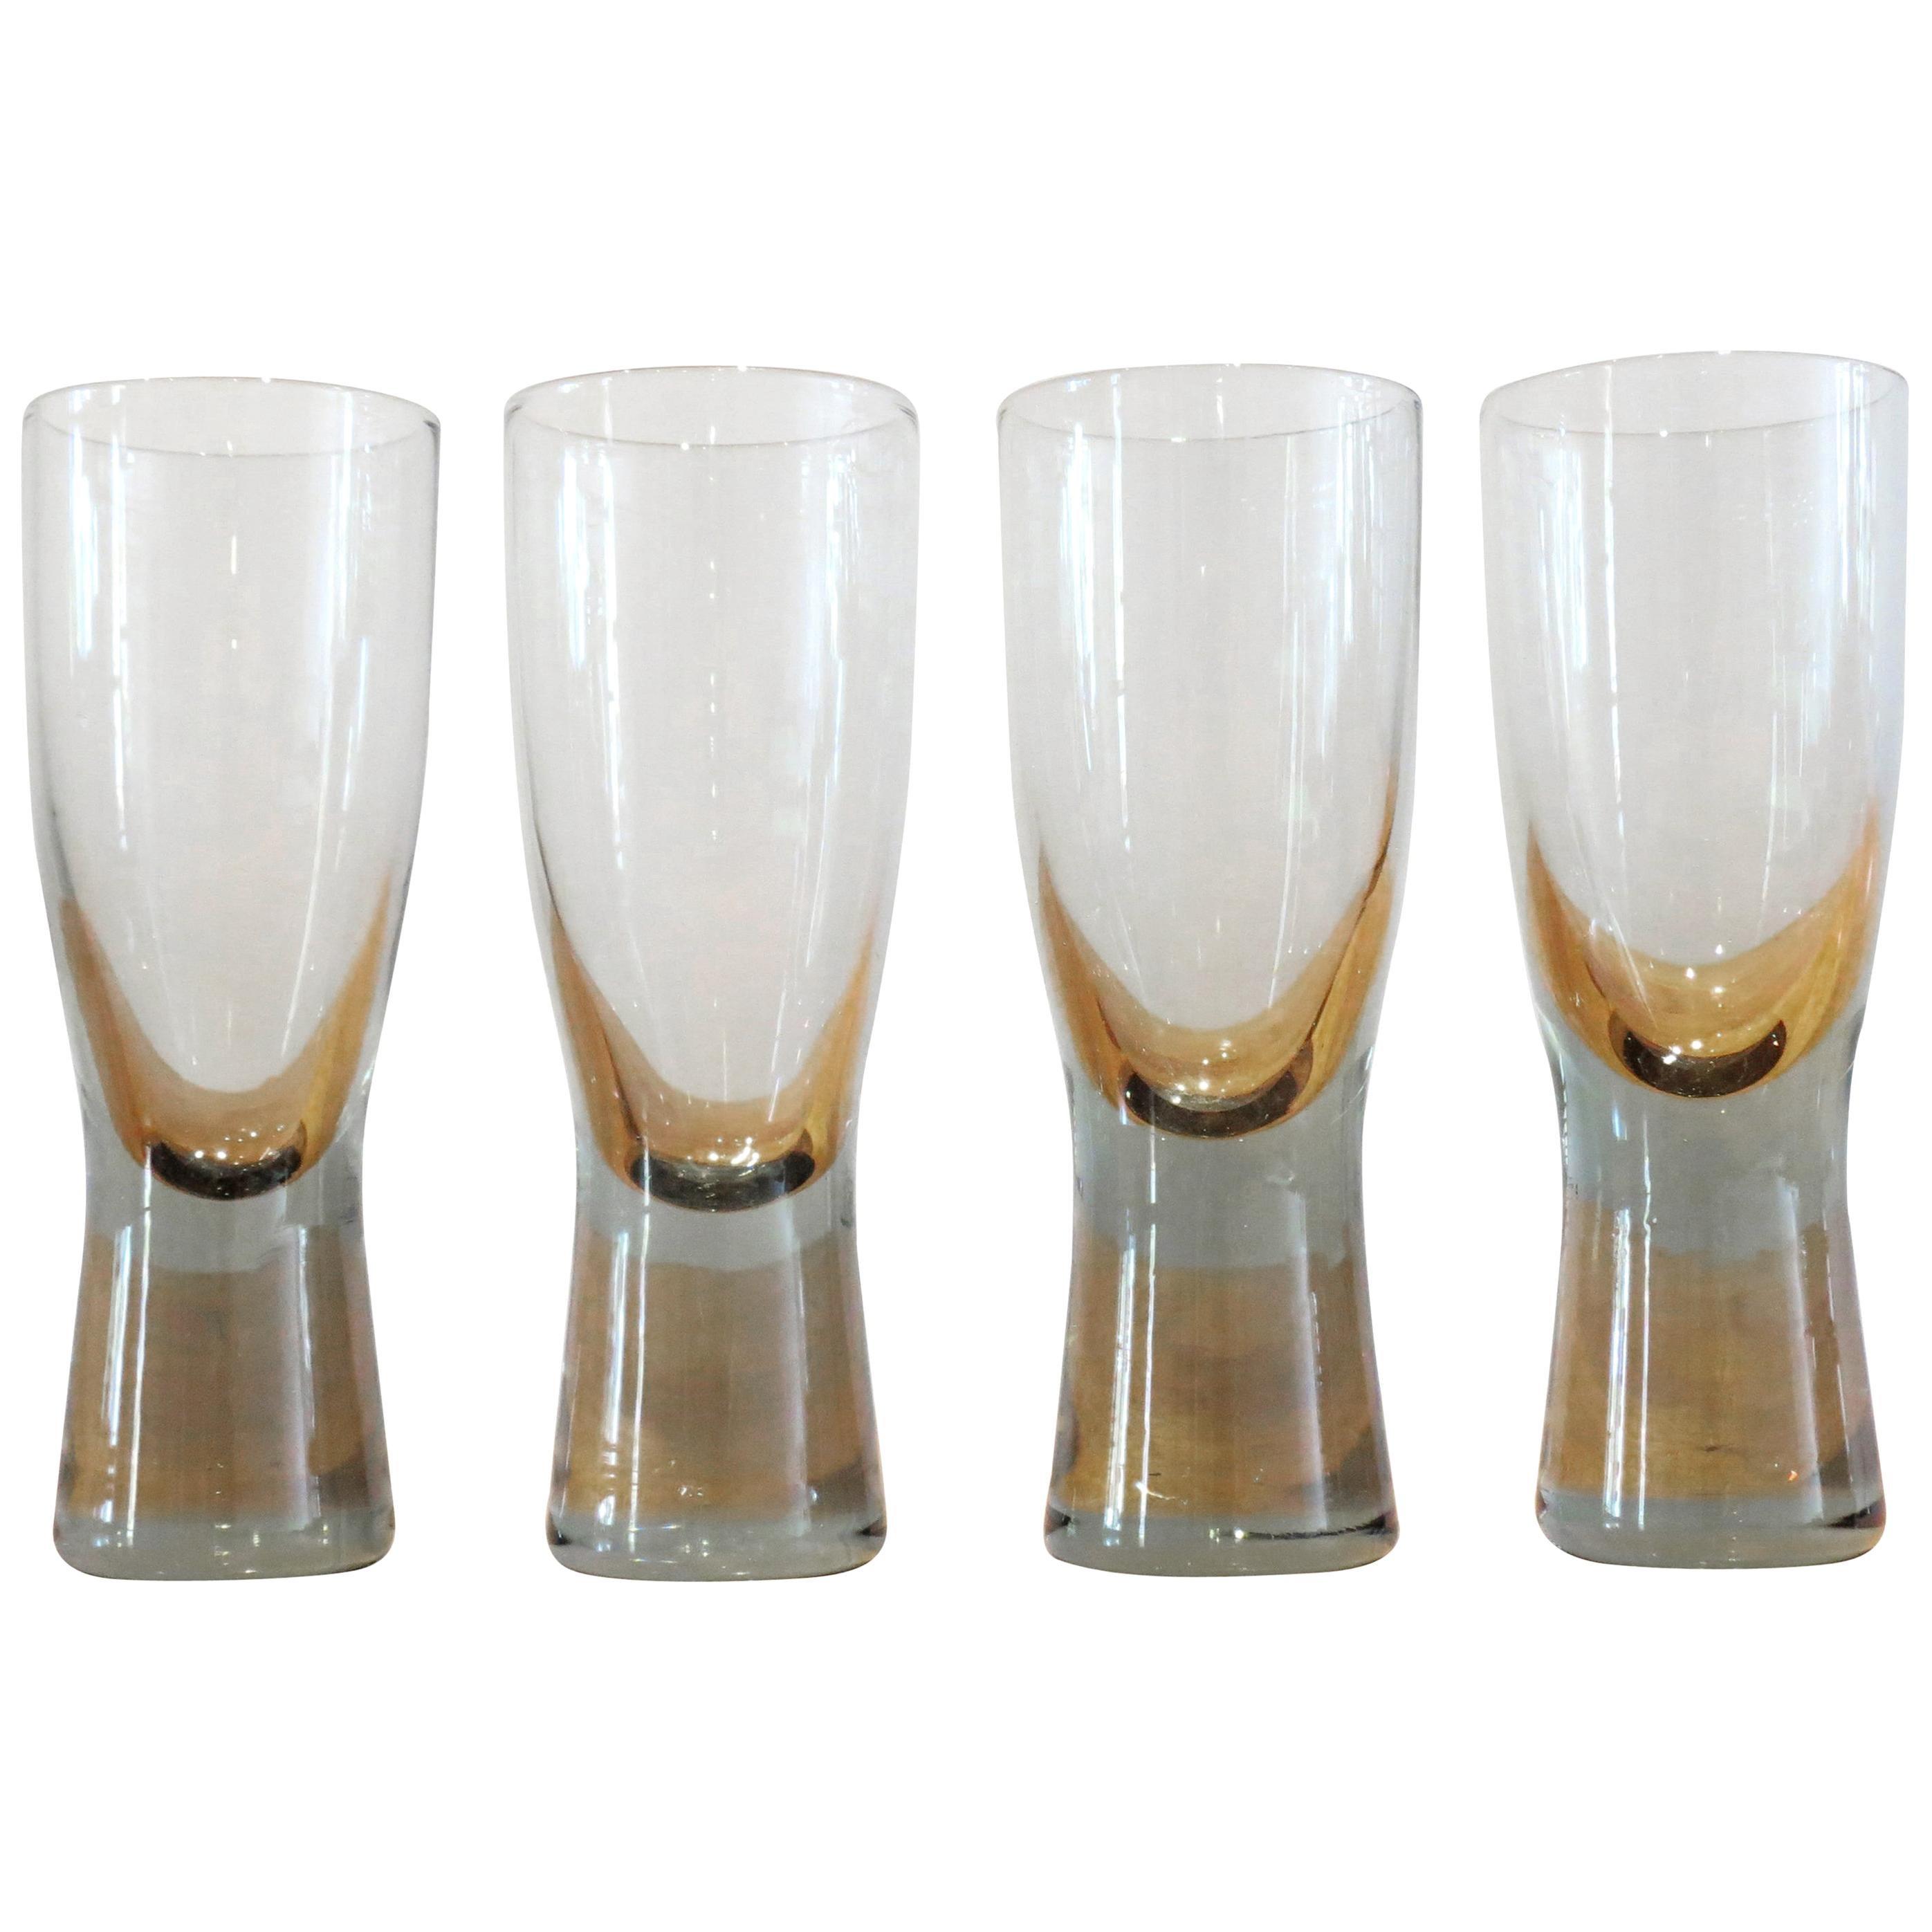 Vintage Set of 4 Danish Holmegaard Canada Smoked Glass Glasses by Per Lutken